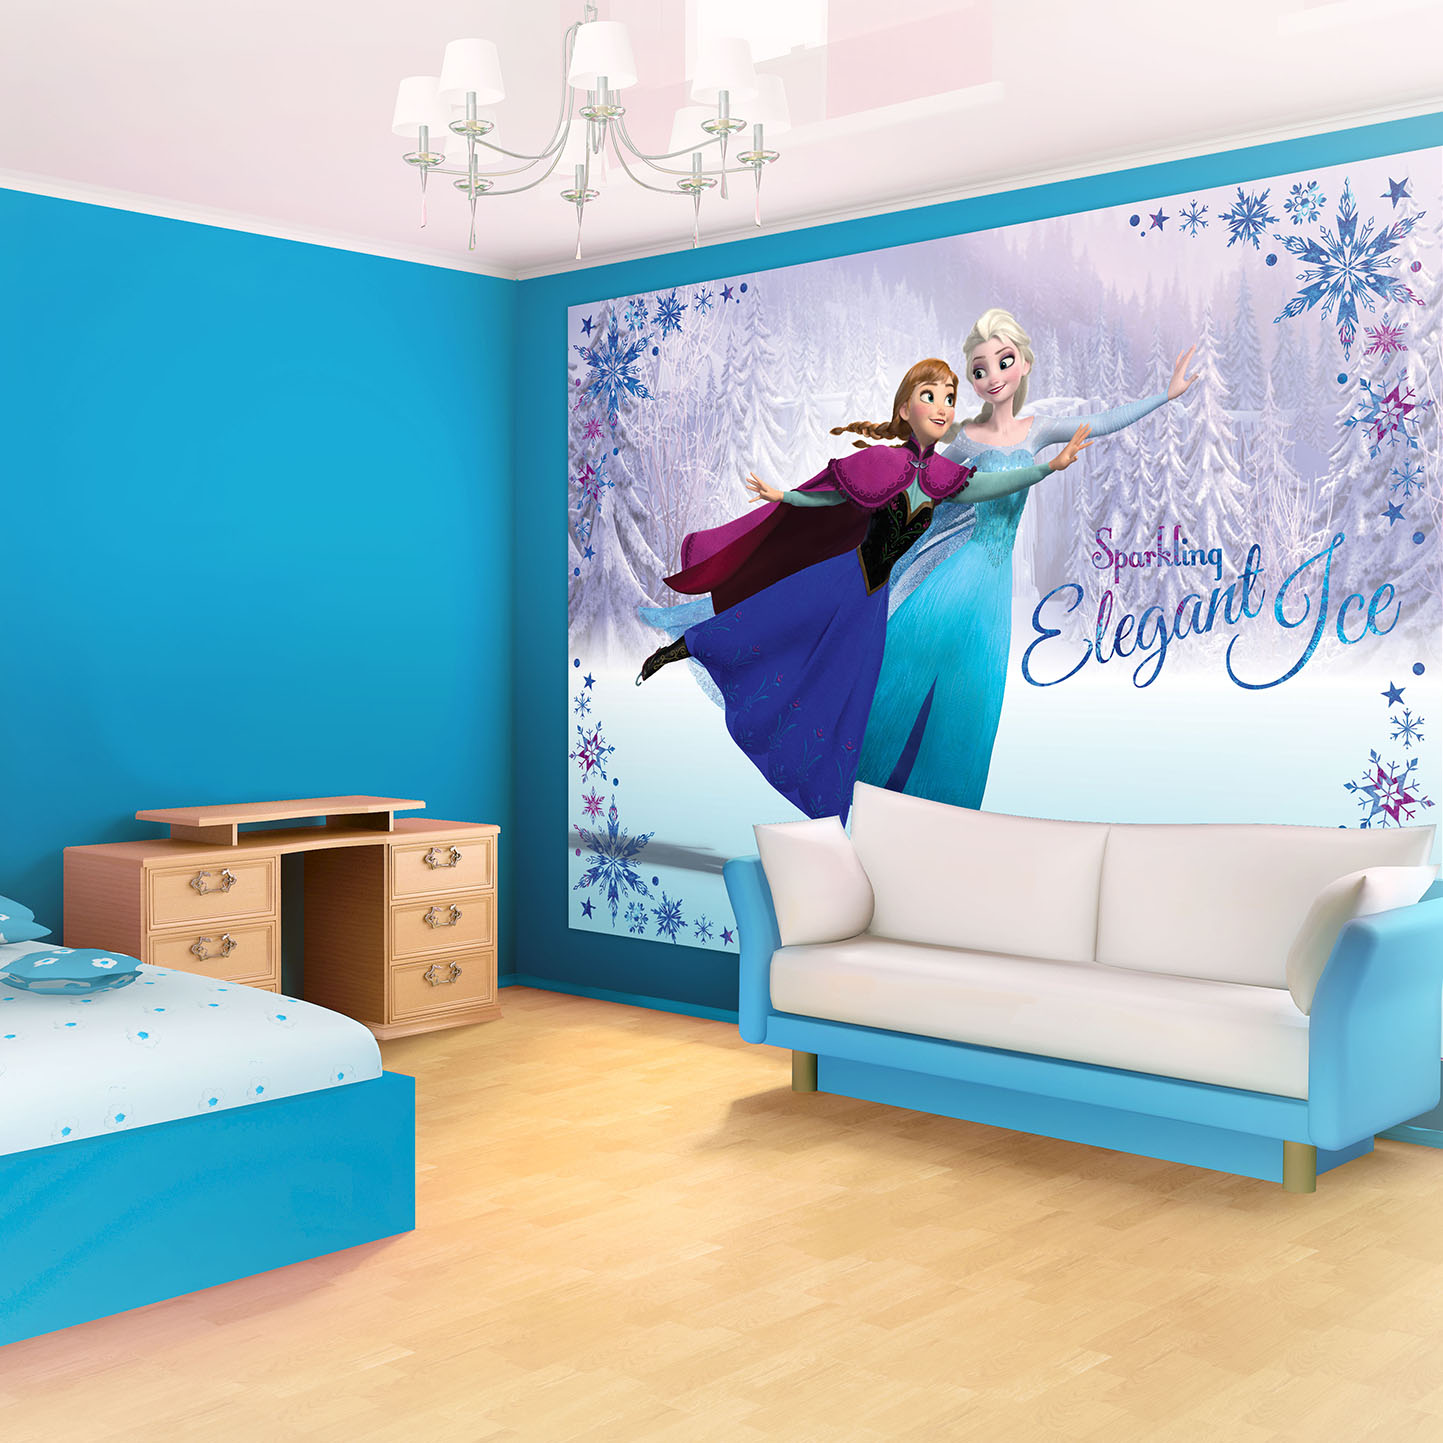 Beton dekoracyjny beton ozdobny studio dekoracji for Disney kinderzimmer komplett